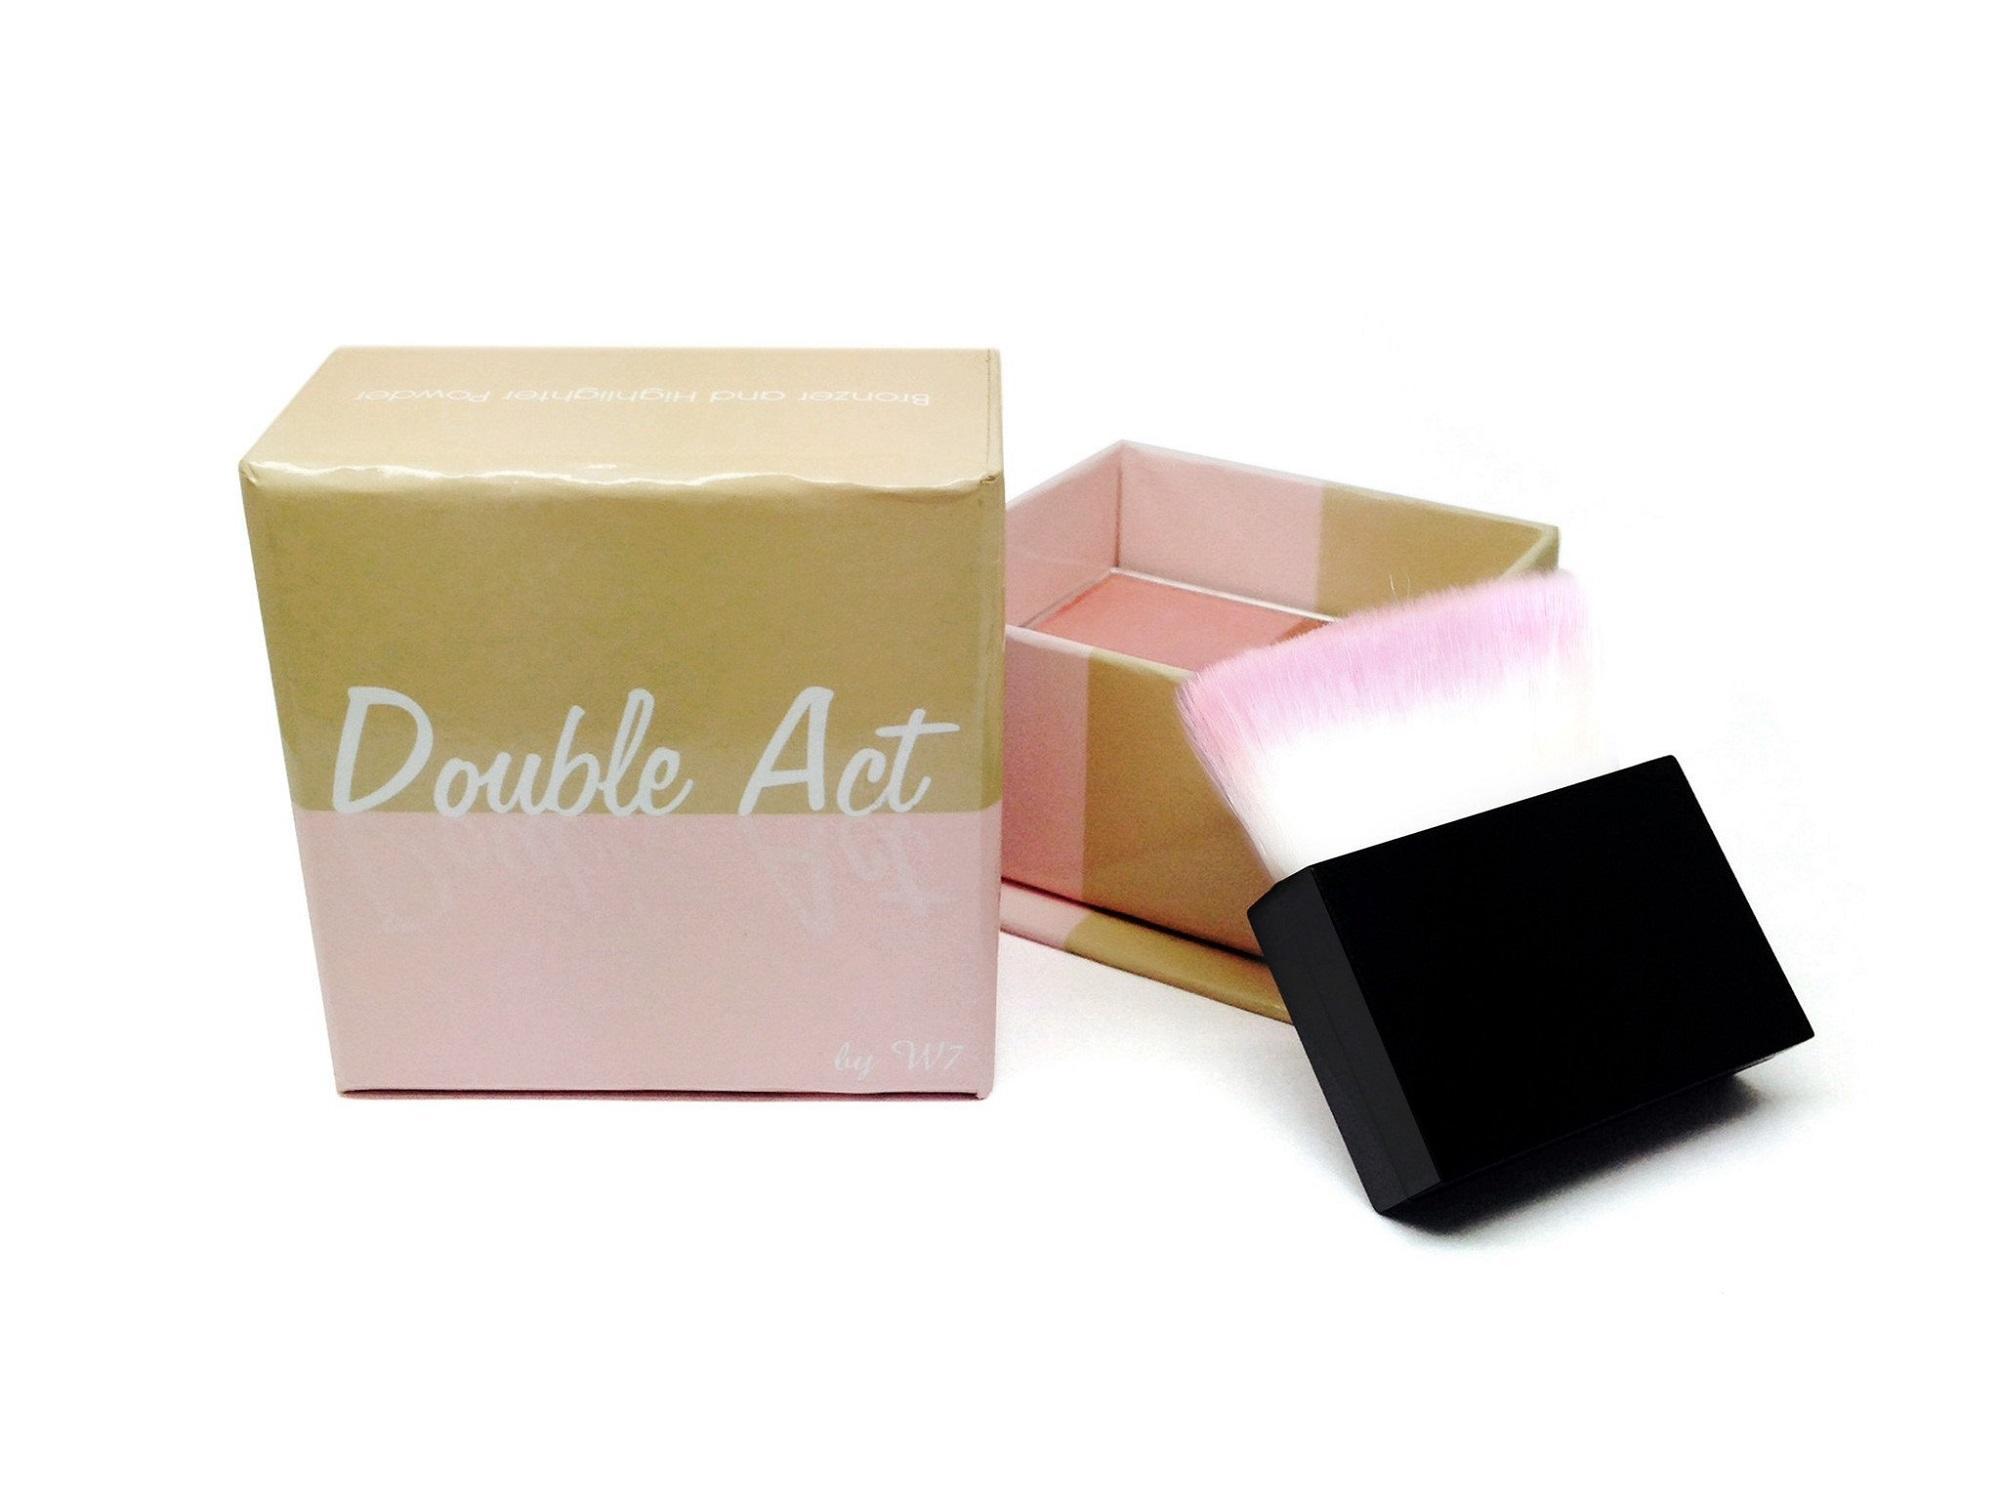 Double Act Powder Philippines